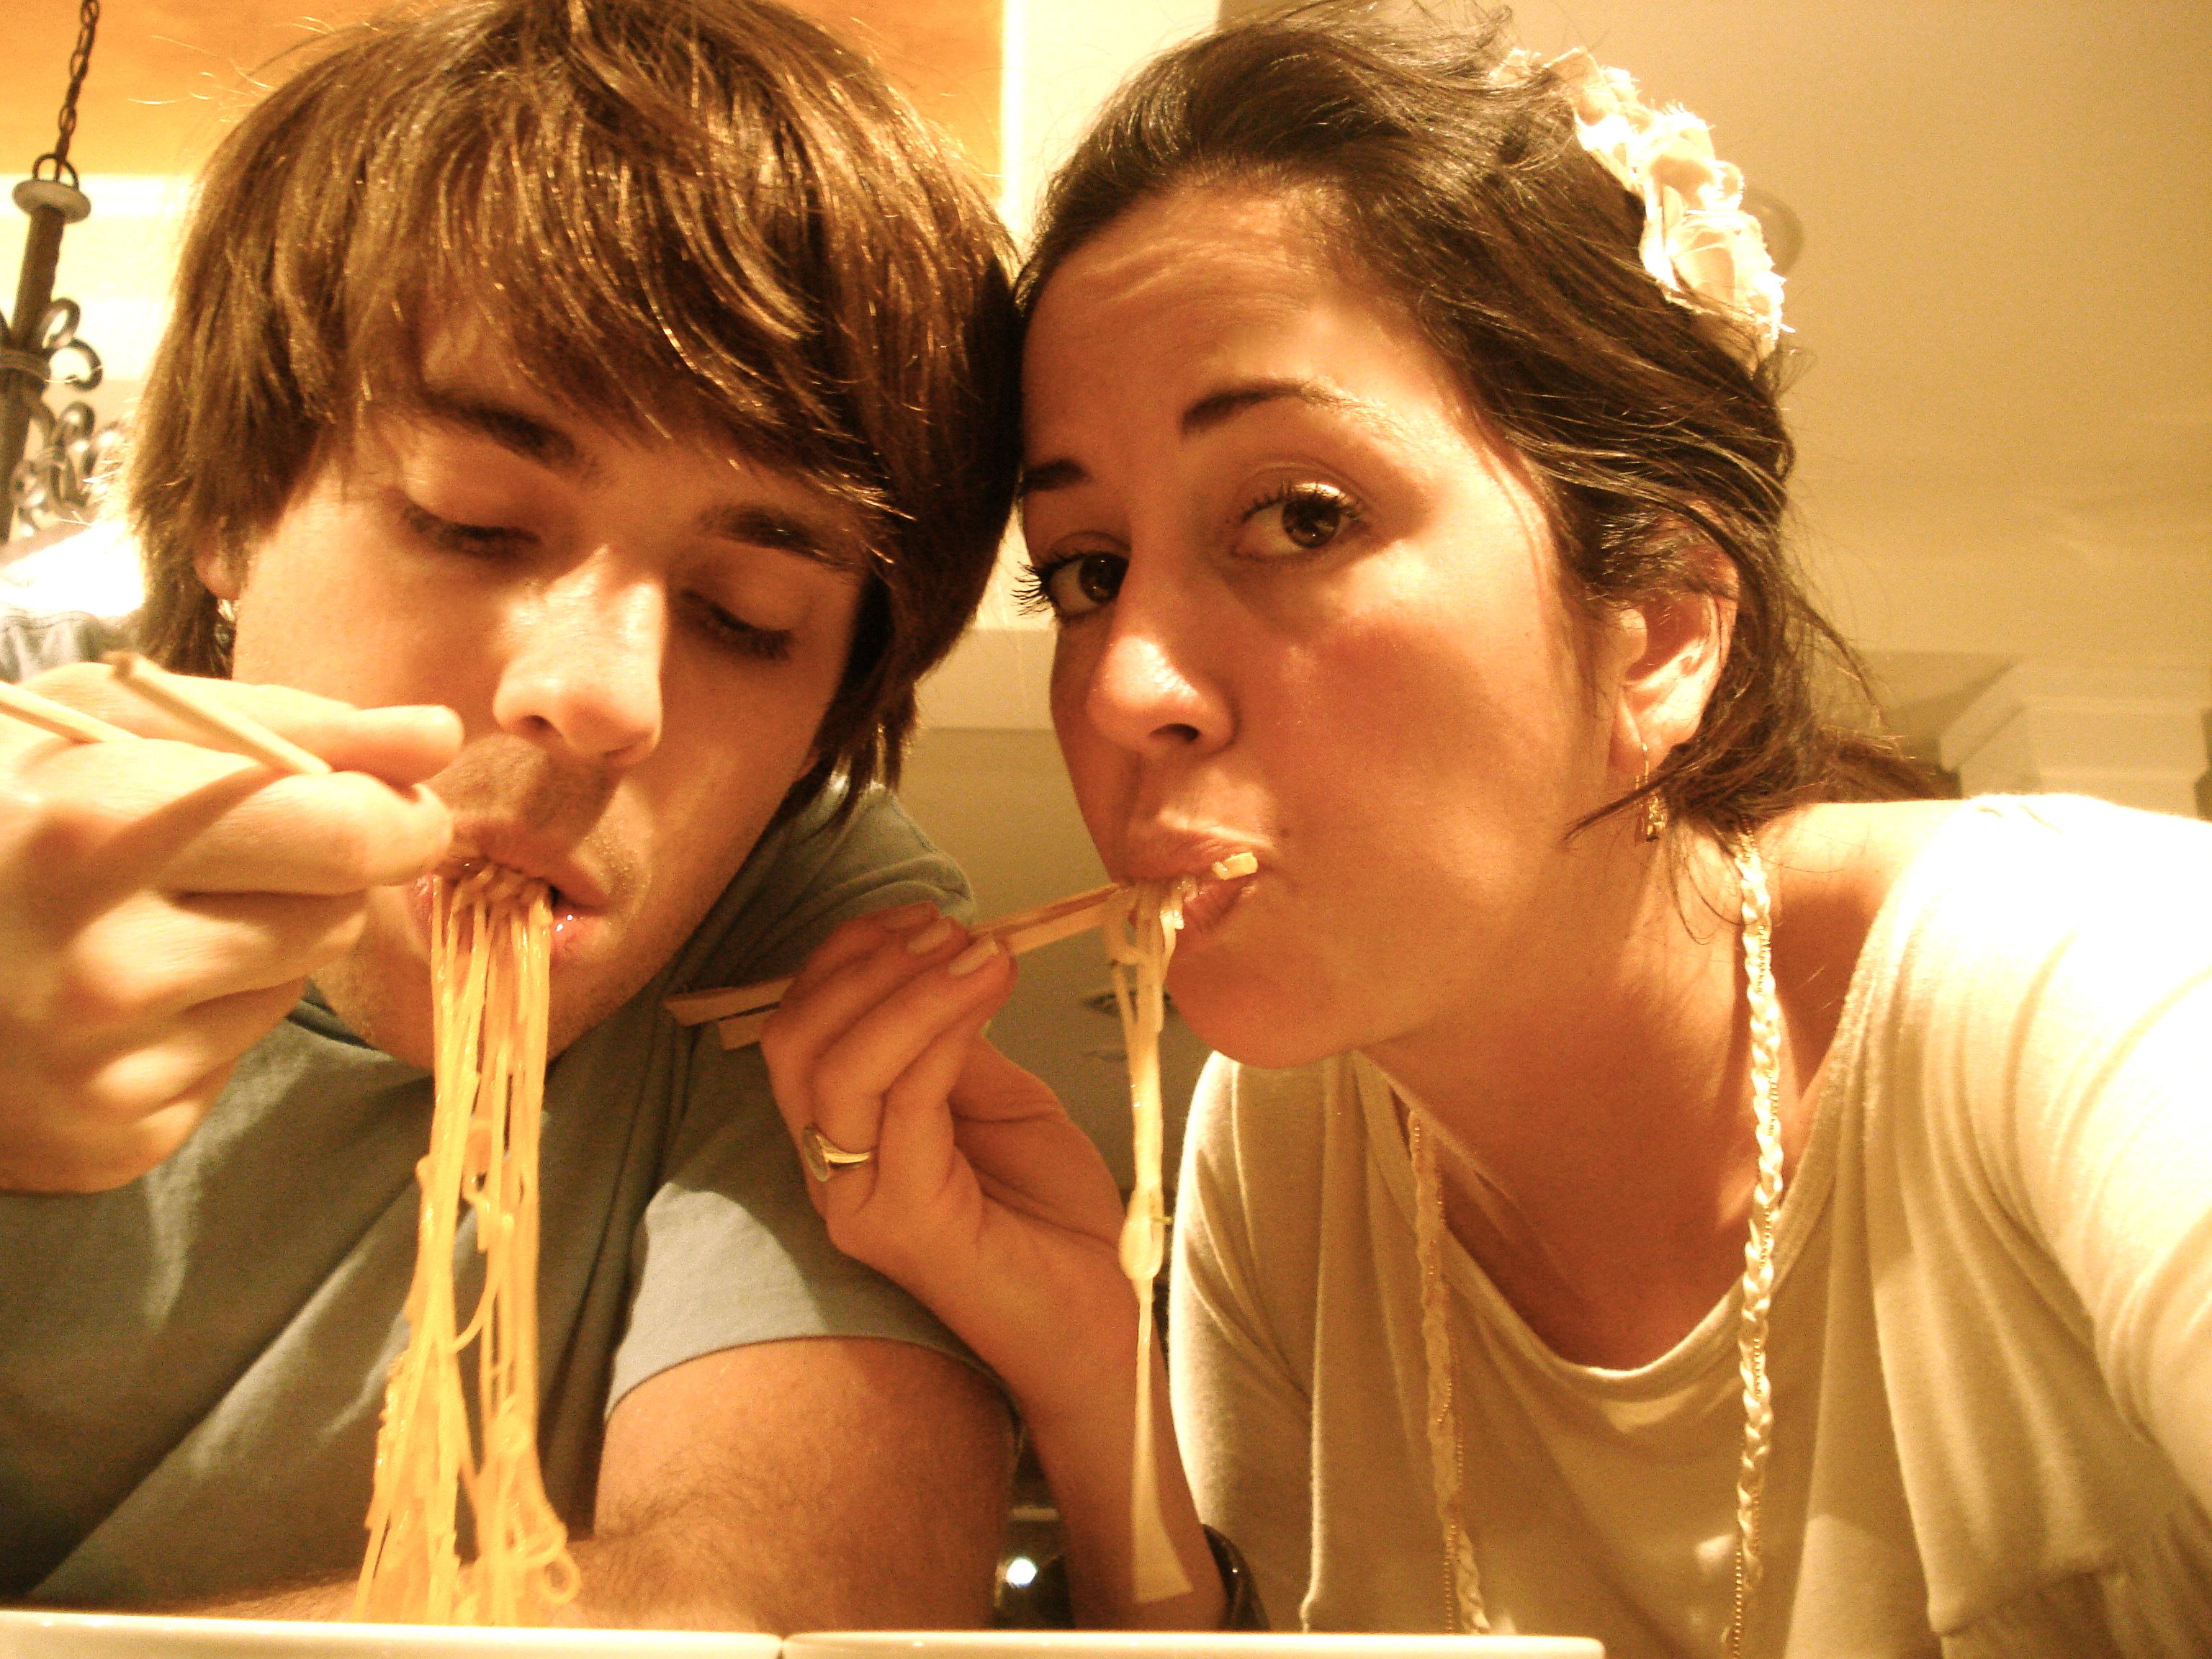 Enjoying our most favorite noodle treats.